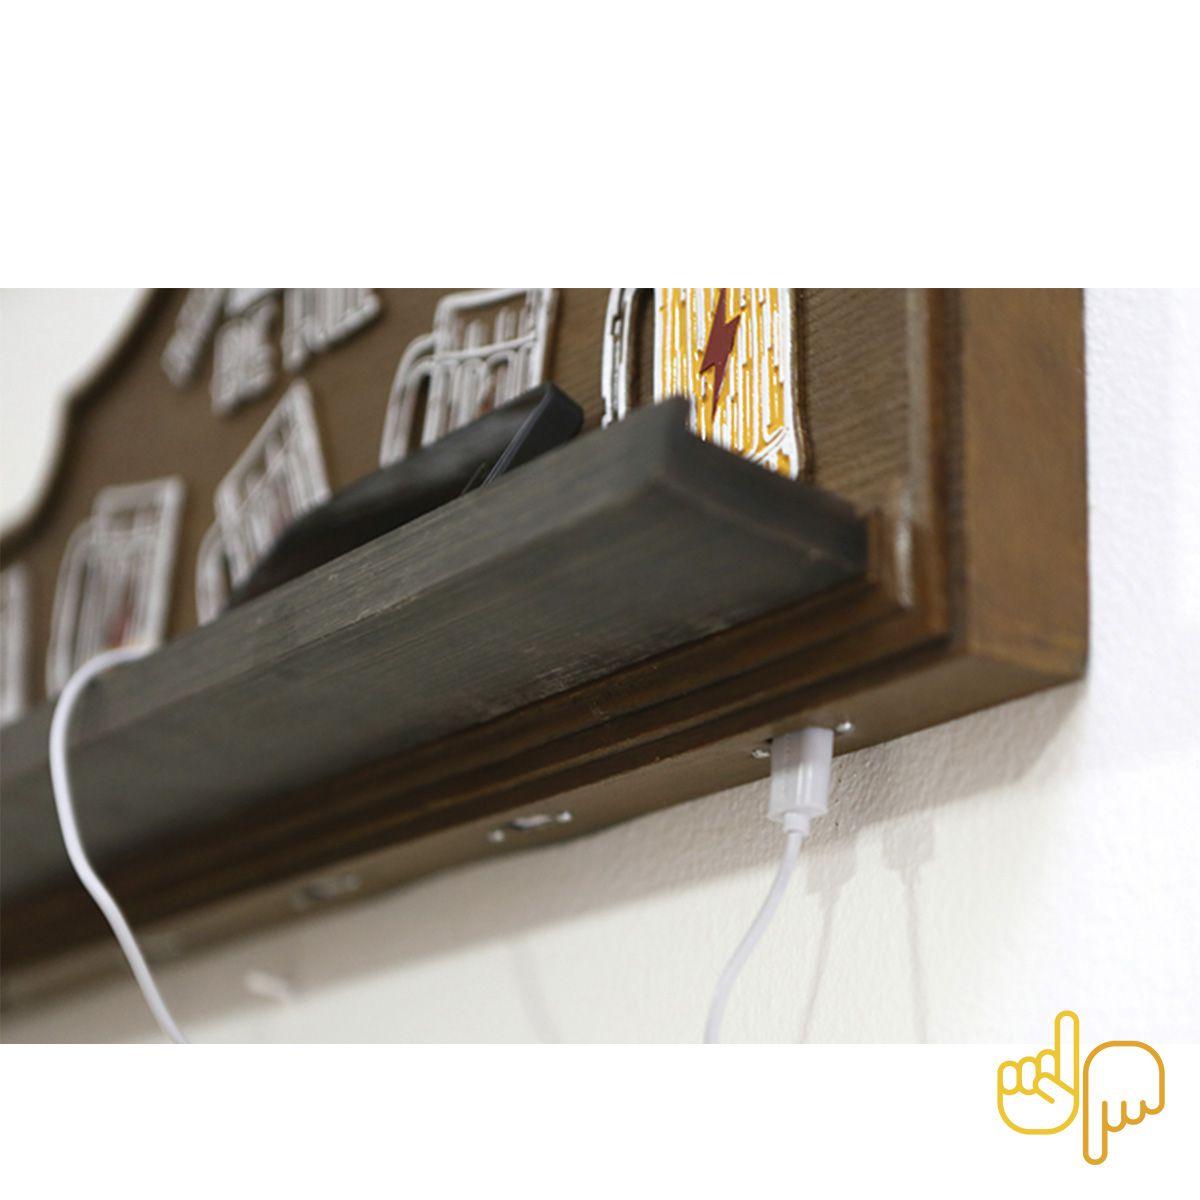 Placa Chopp Beers Carregador de Celular USB Full